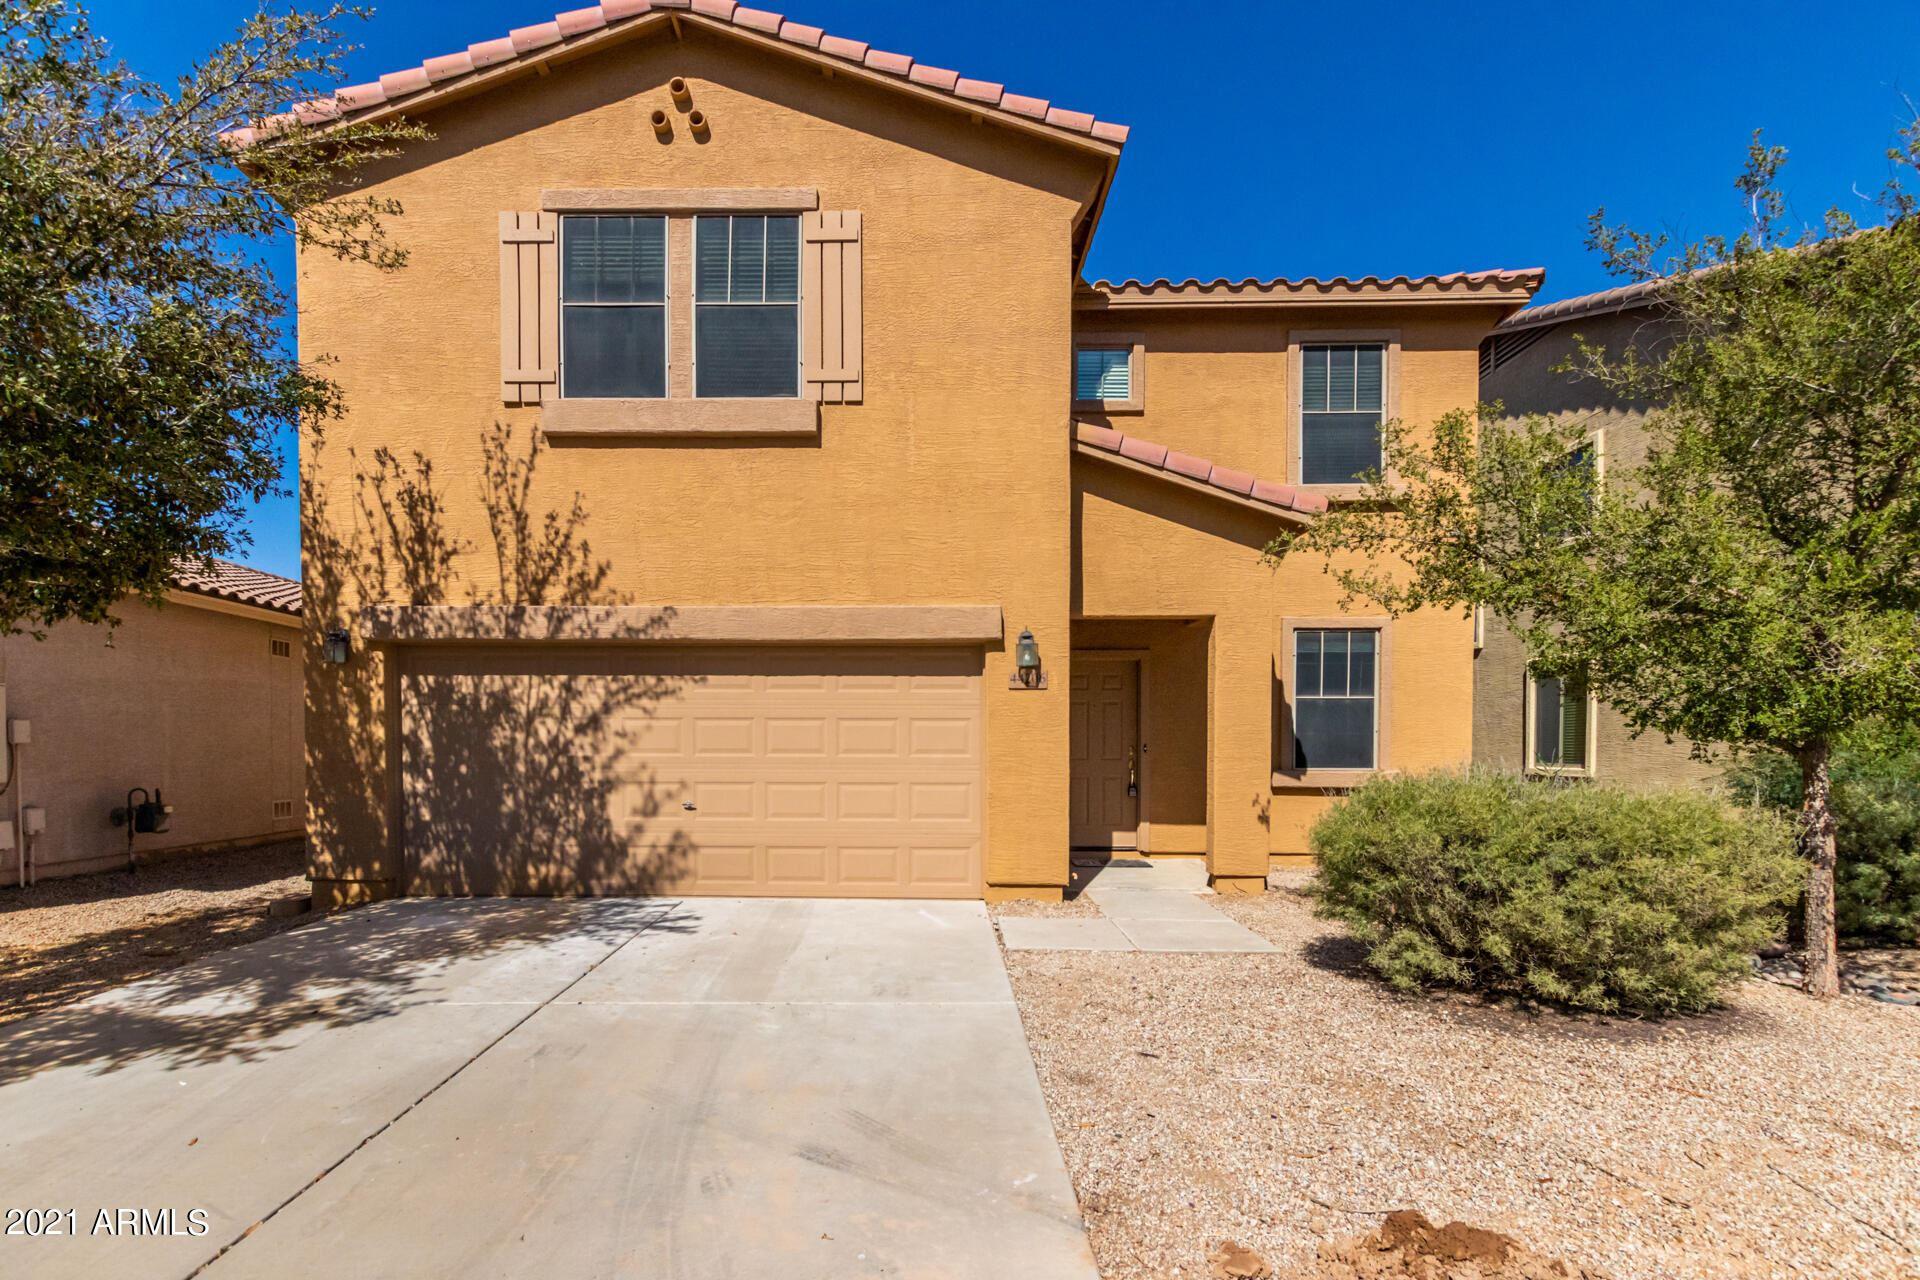 44206 W KRAMER Lane, Maricopa, AZ 85138 - #: 6308385